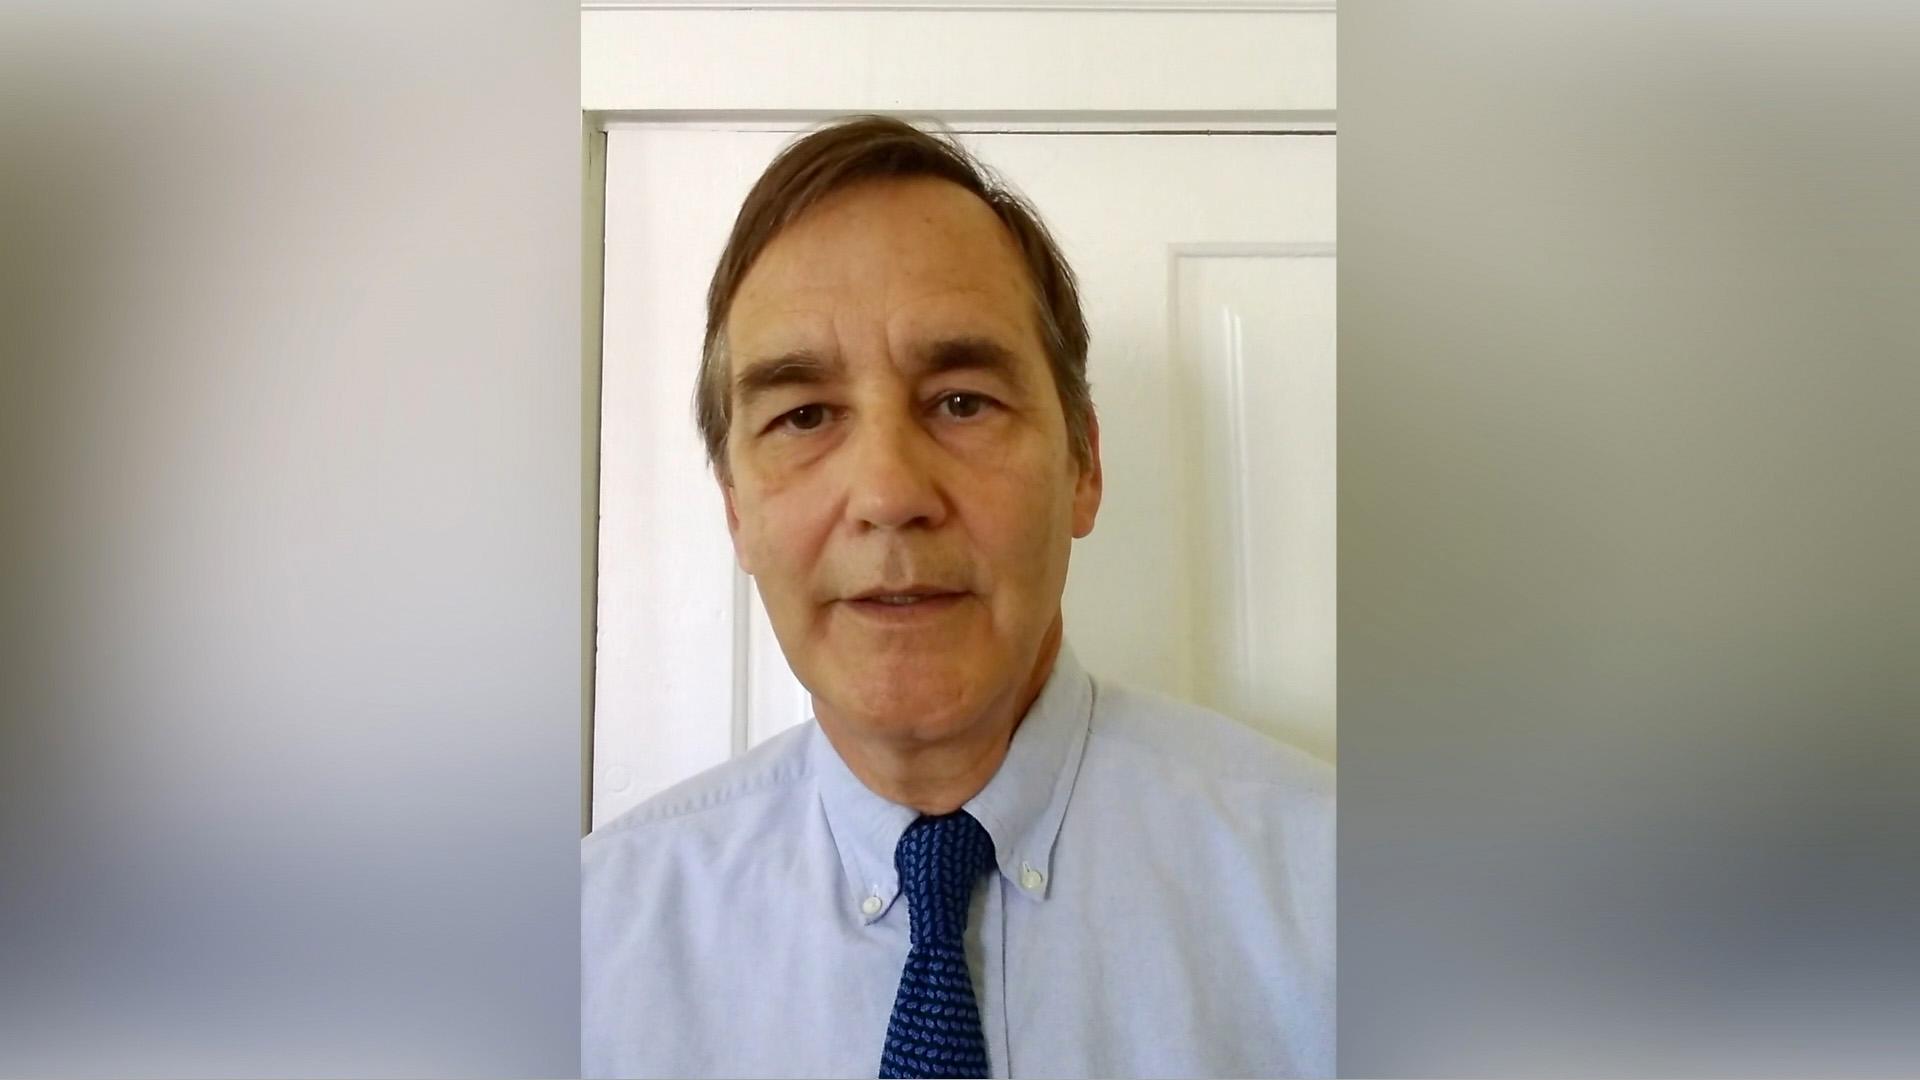 Dr. Patrick Roche Video Message